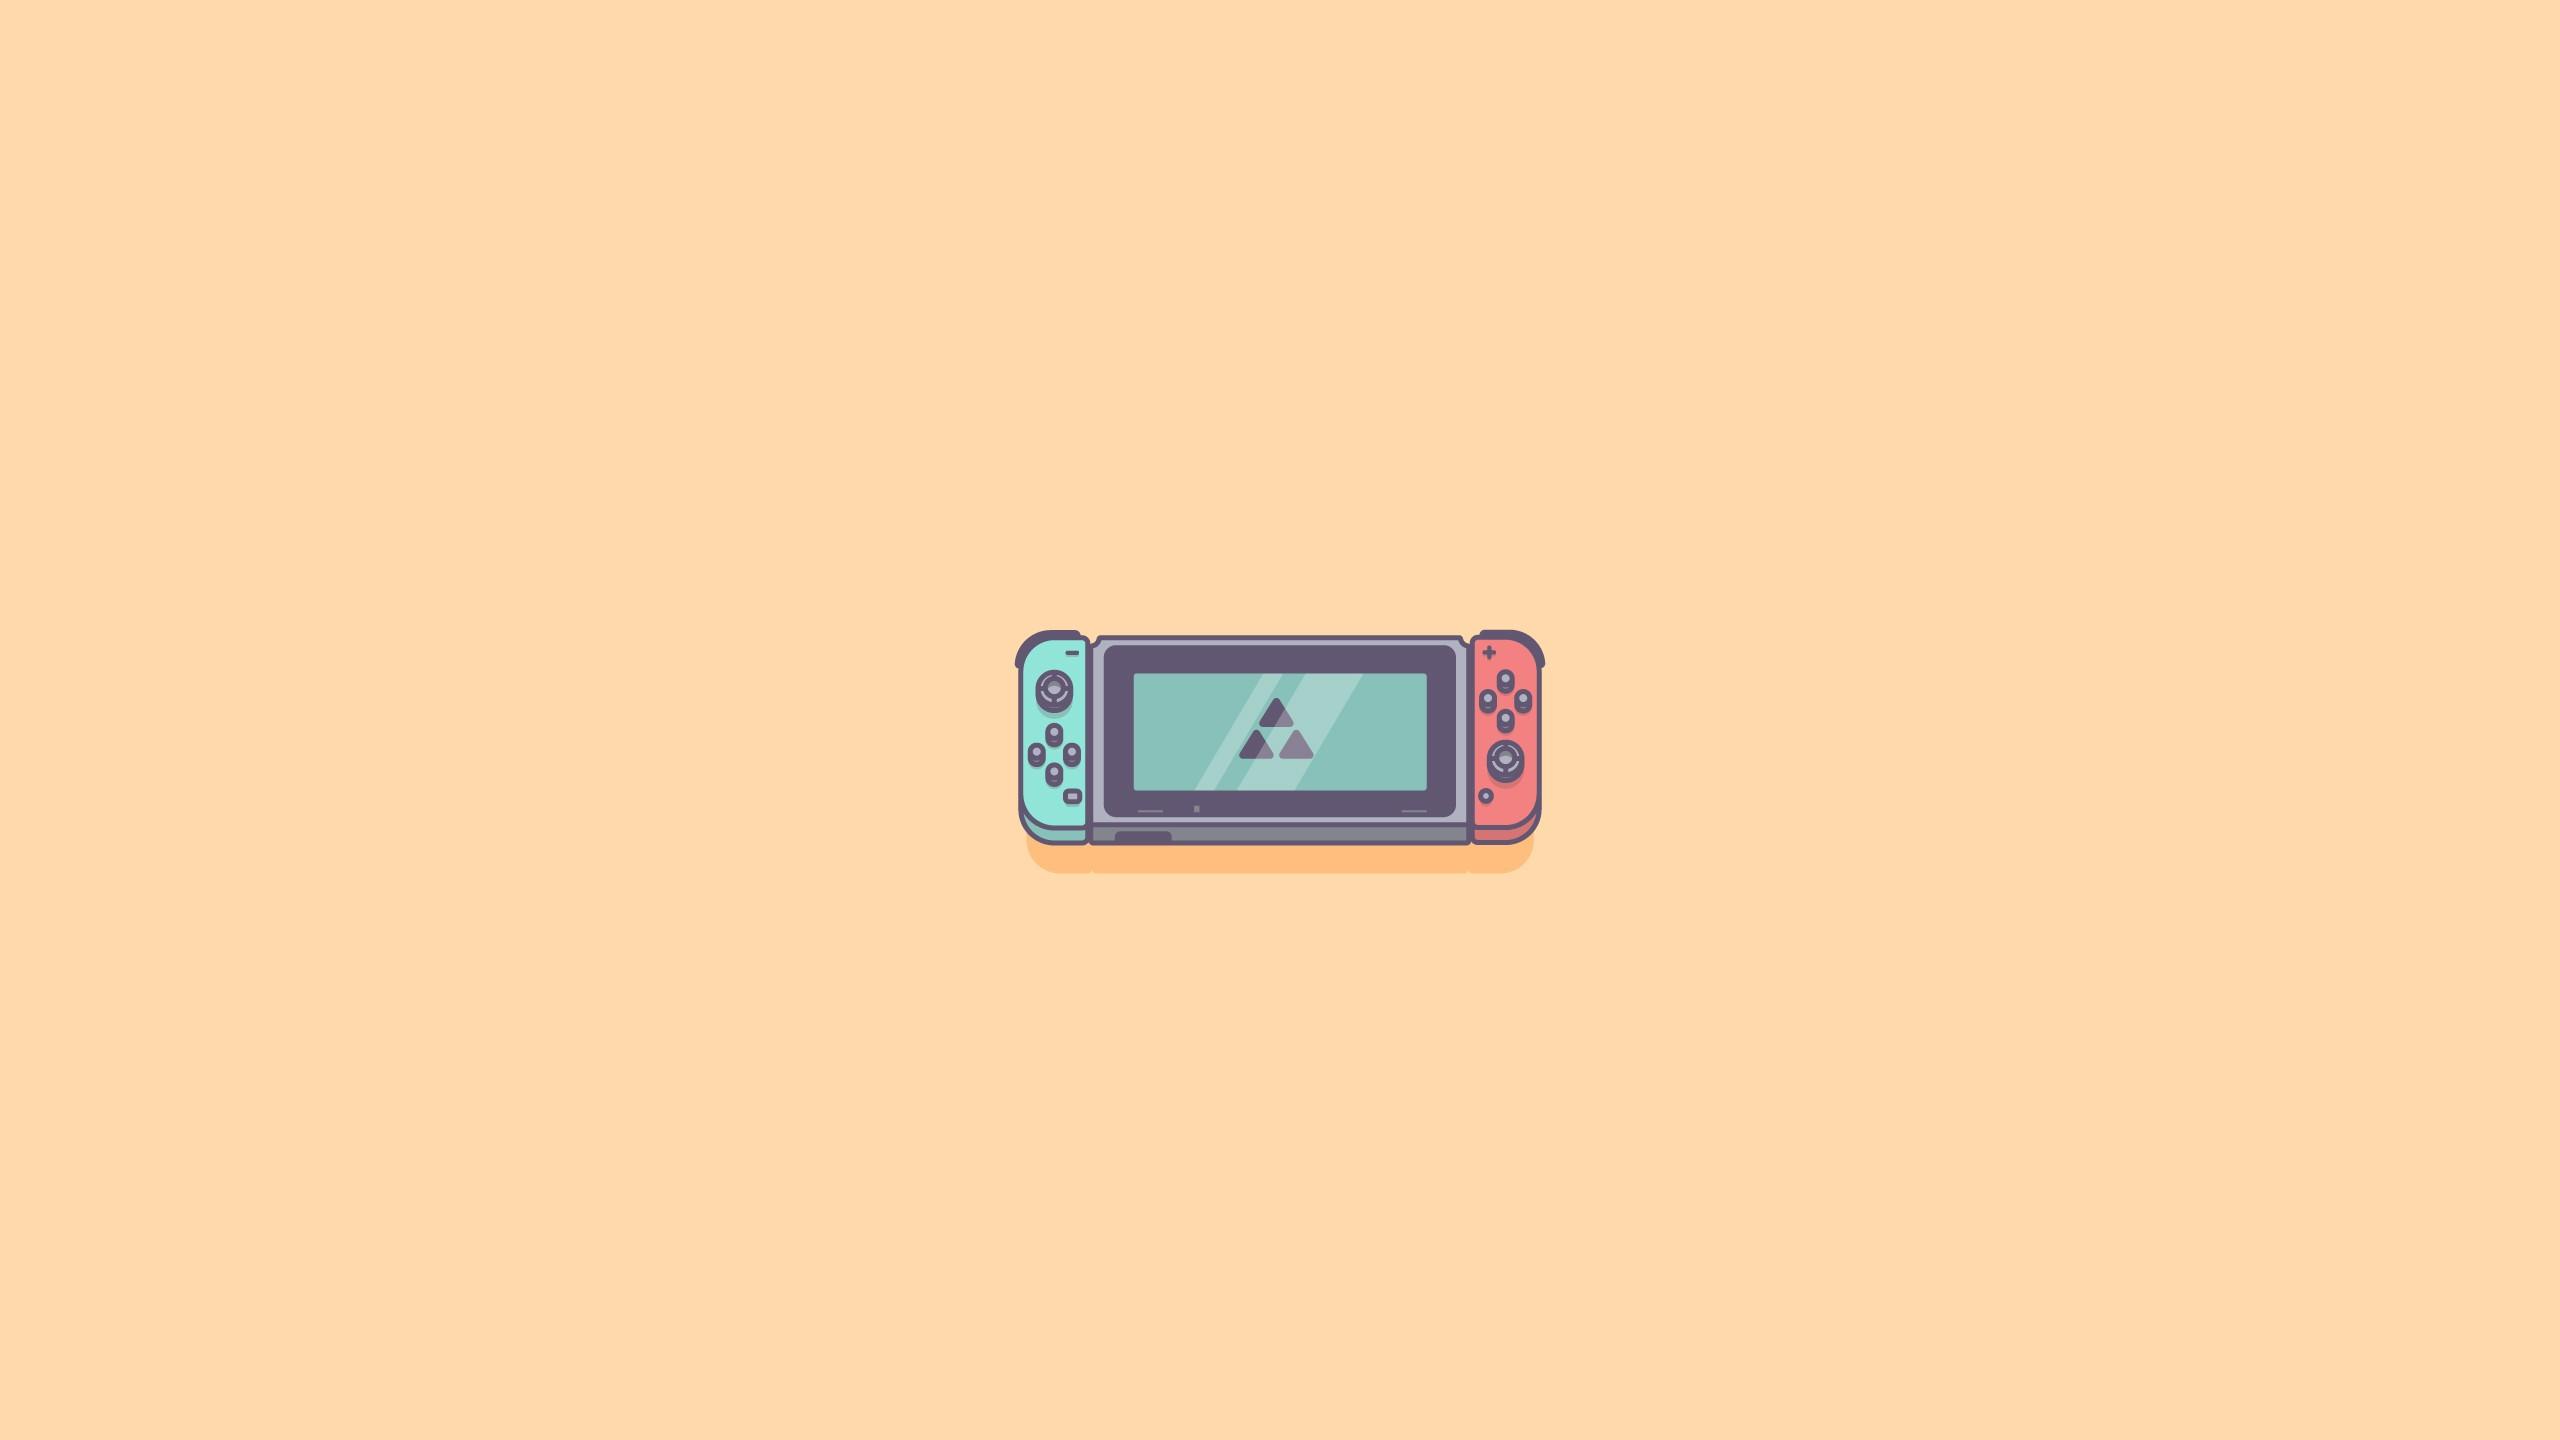 Le switch Nintendo